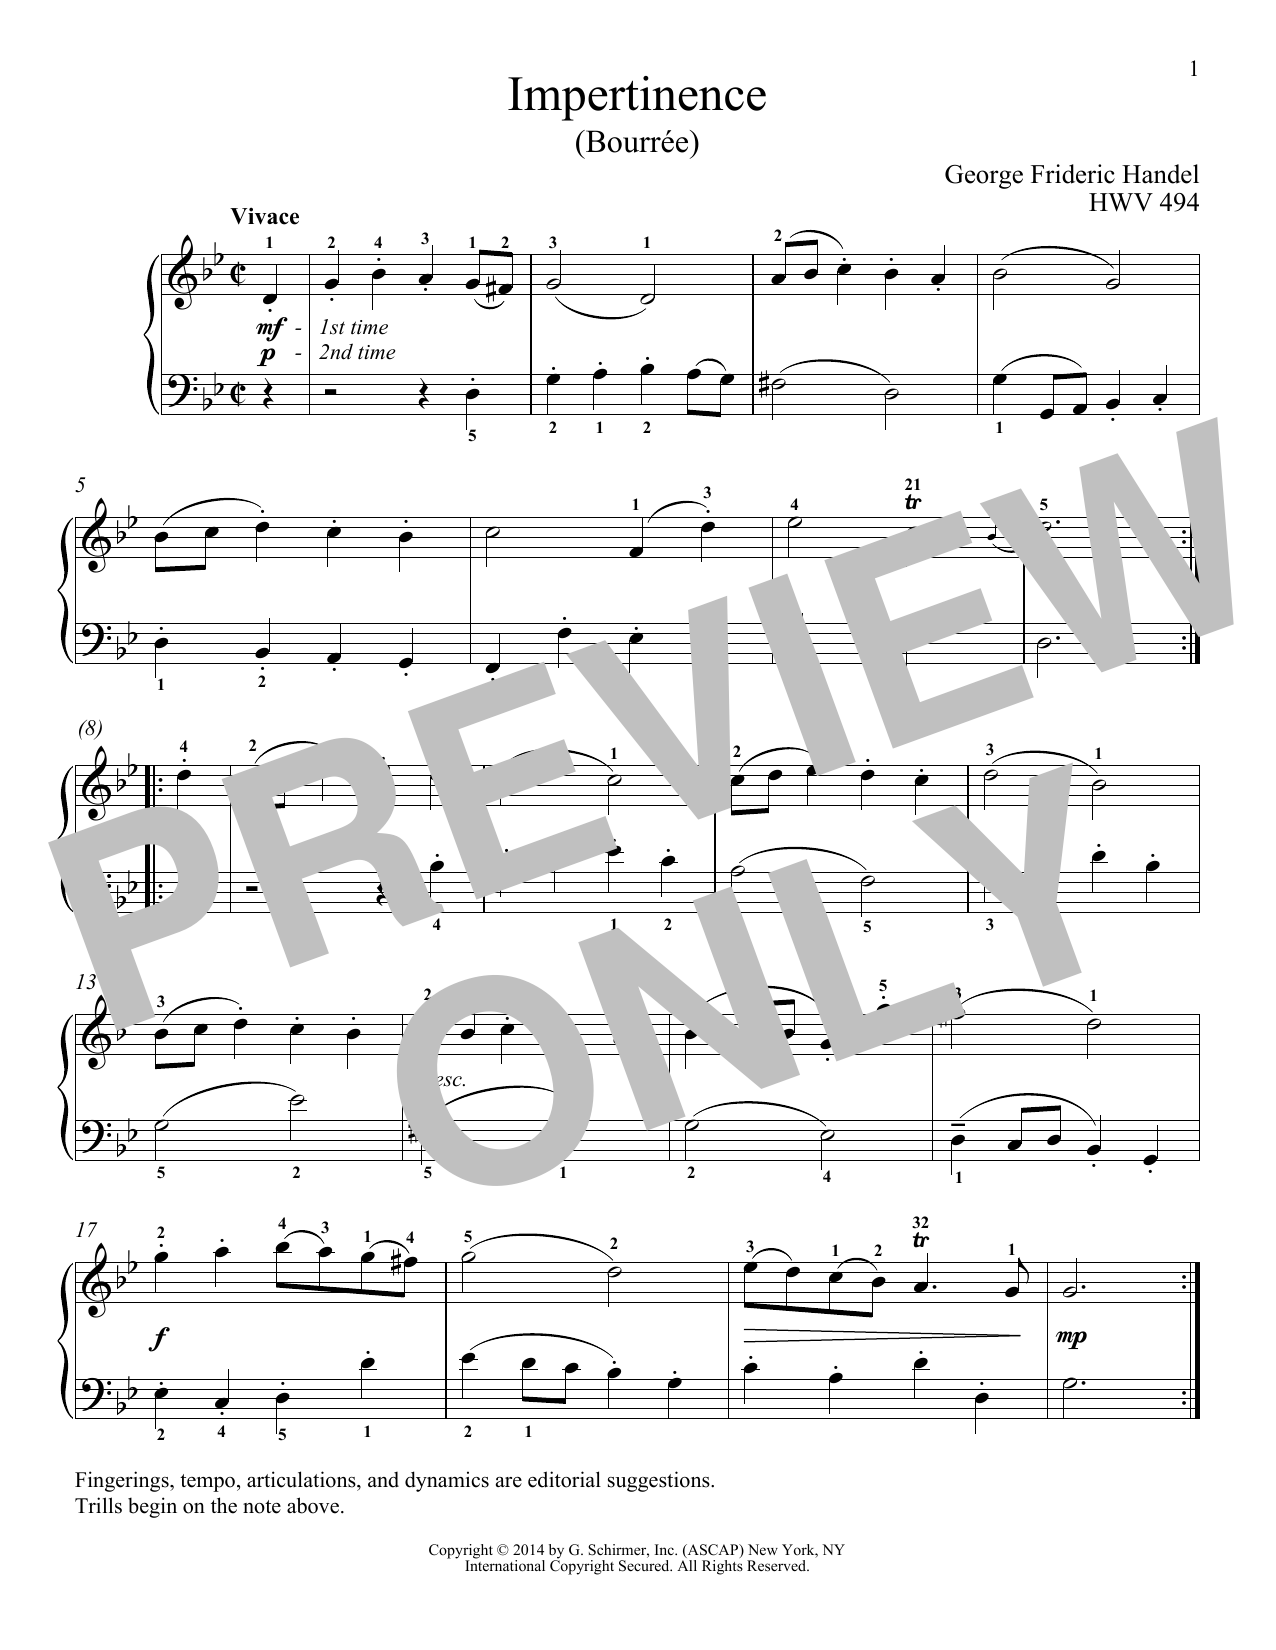 Impertinence, HWV 494 (Piano Solo)